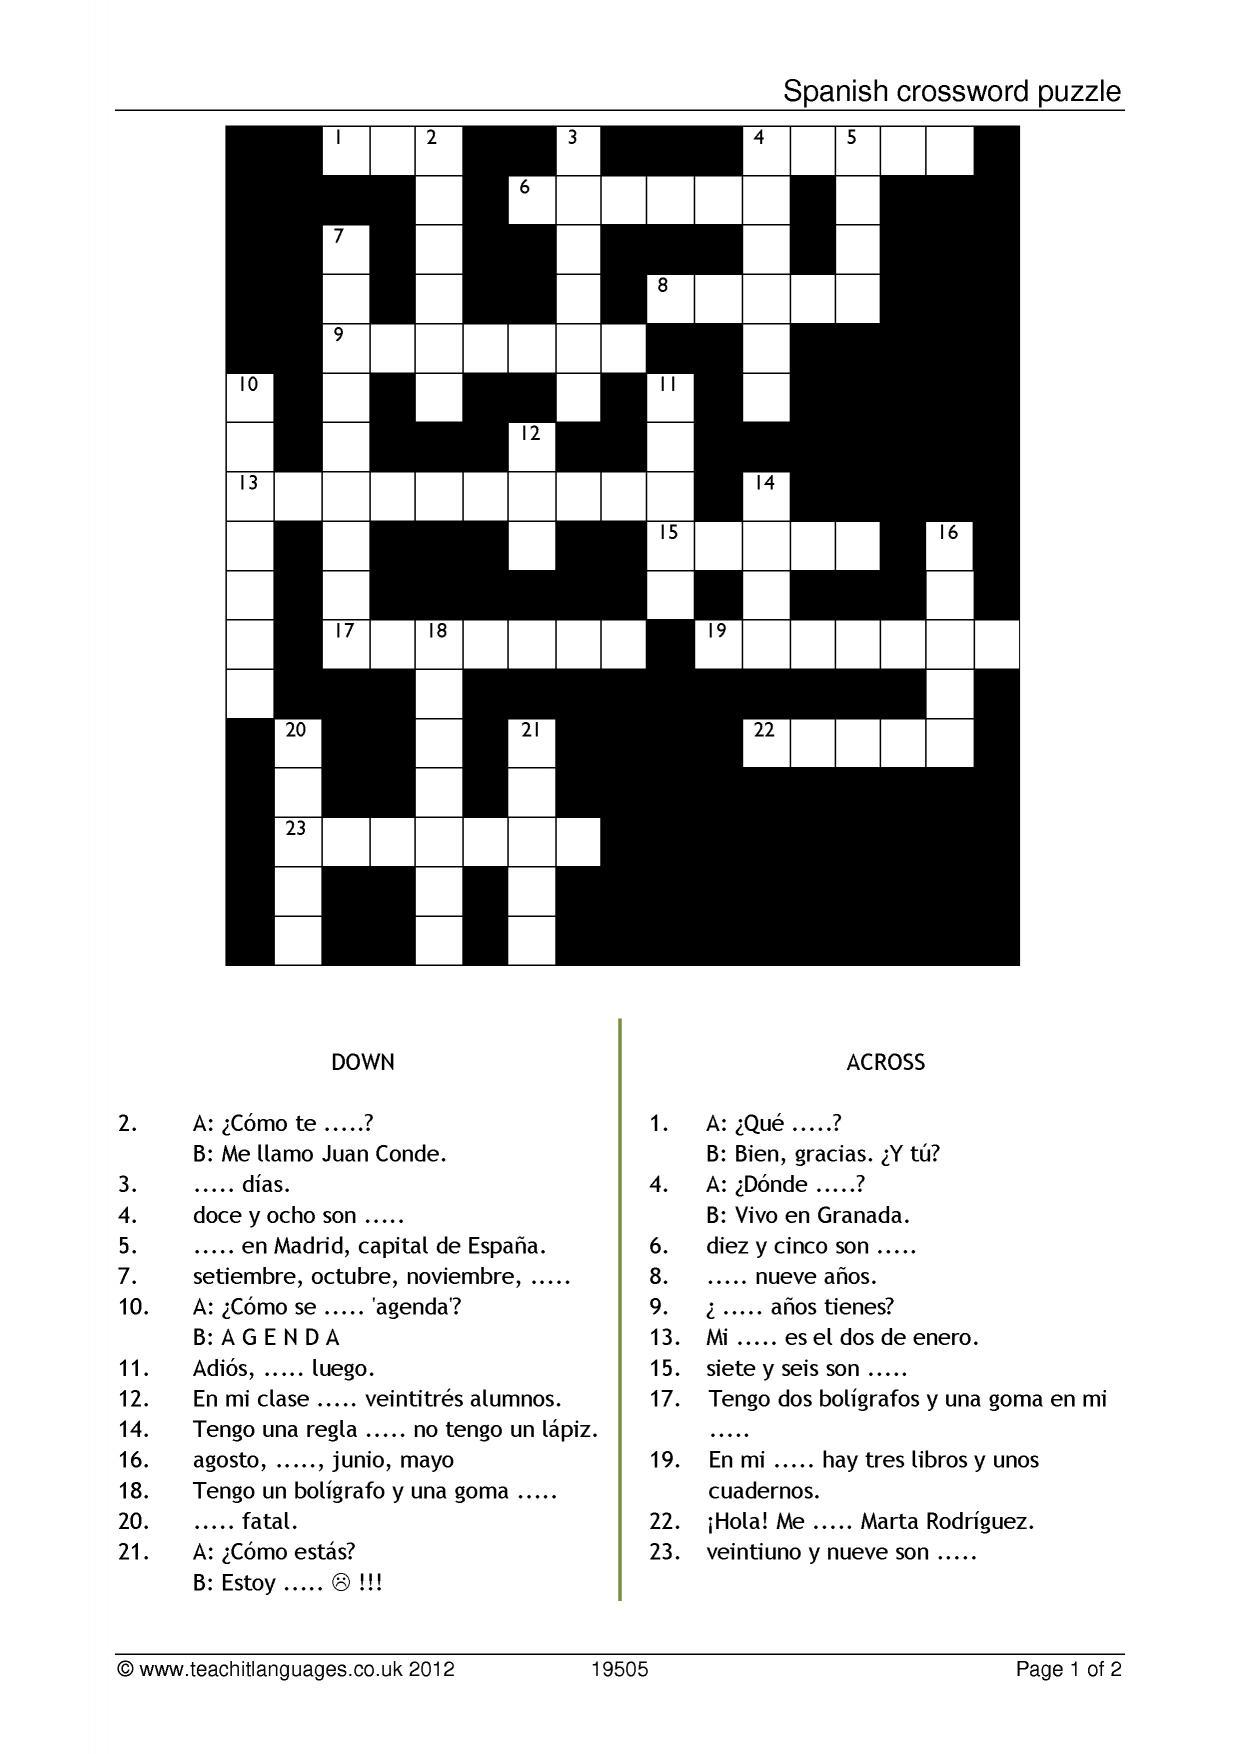 Spanish Crossword Puzzle